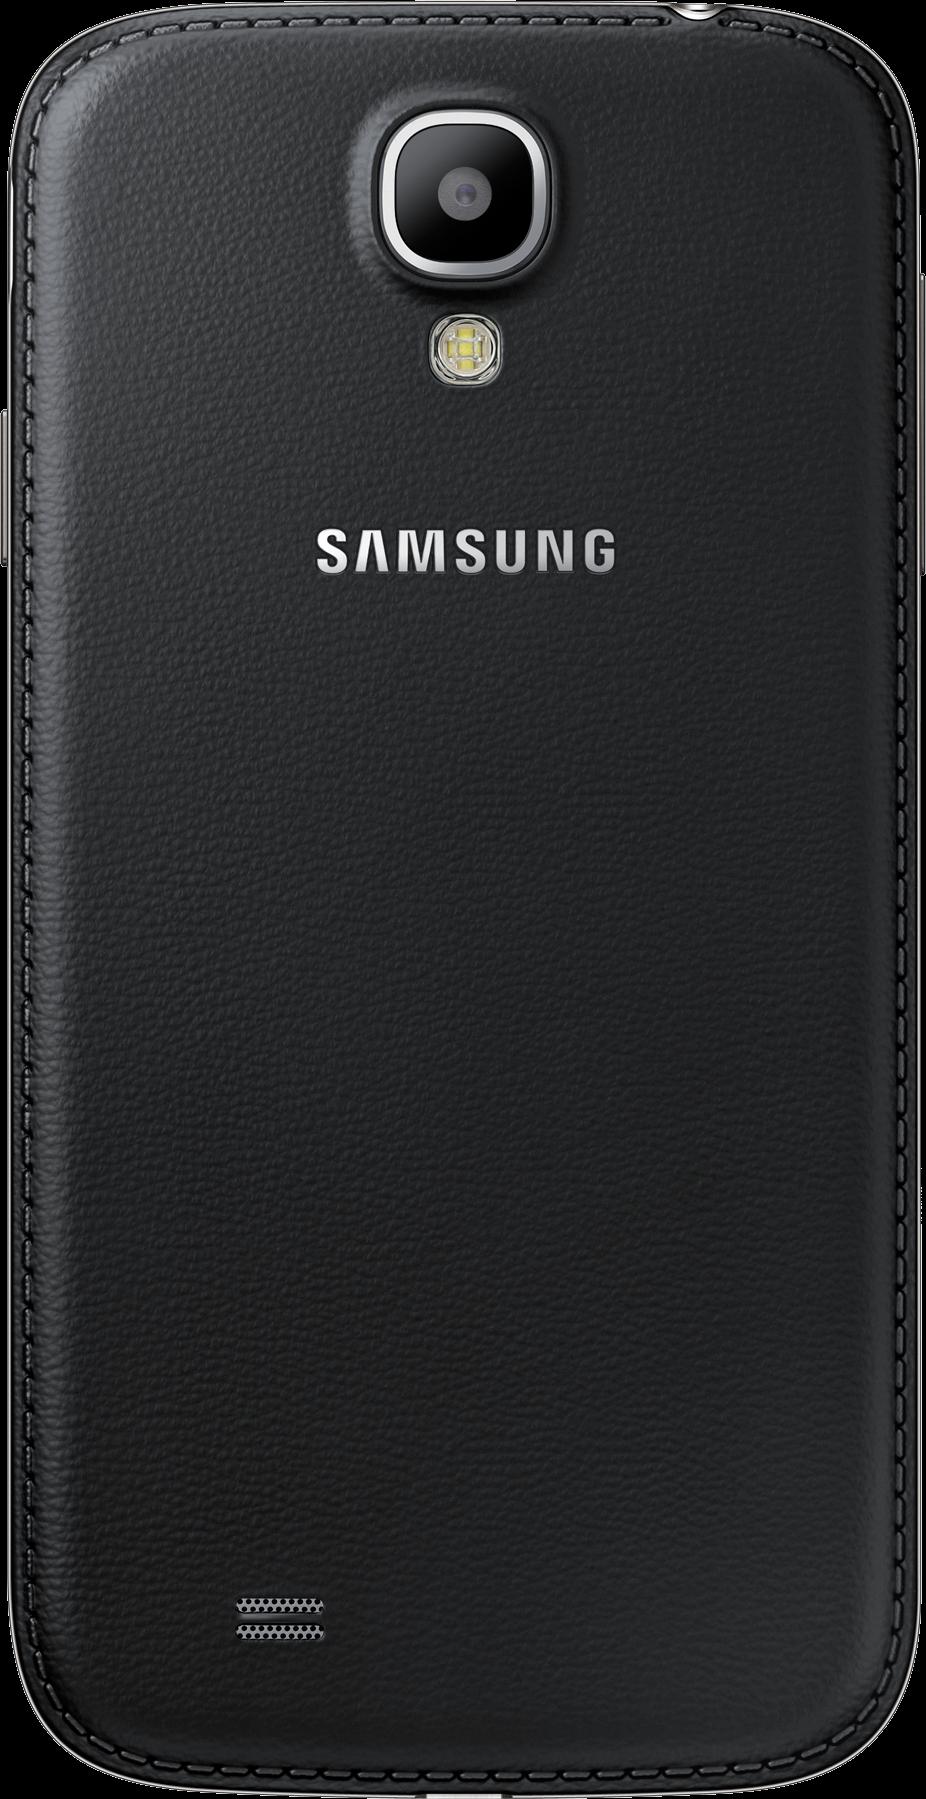 Samsung Galaxy S4 I9500 16 GB | CellphoneS.com.vn-4